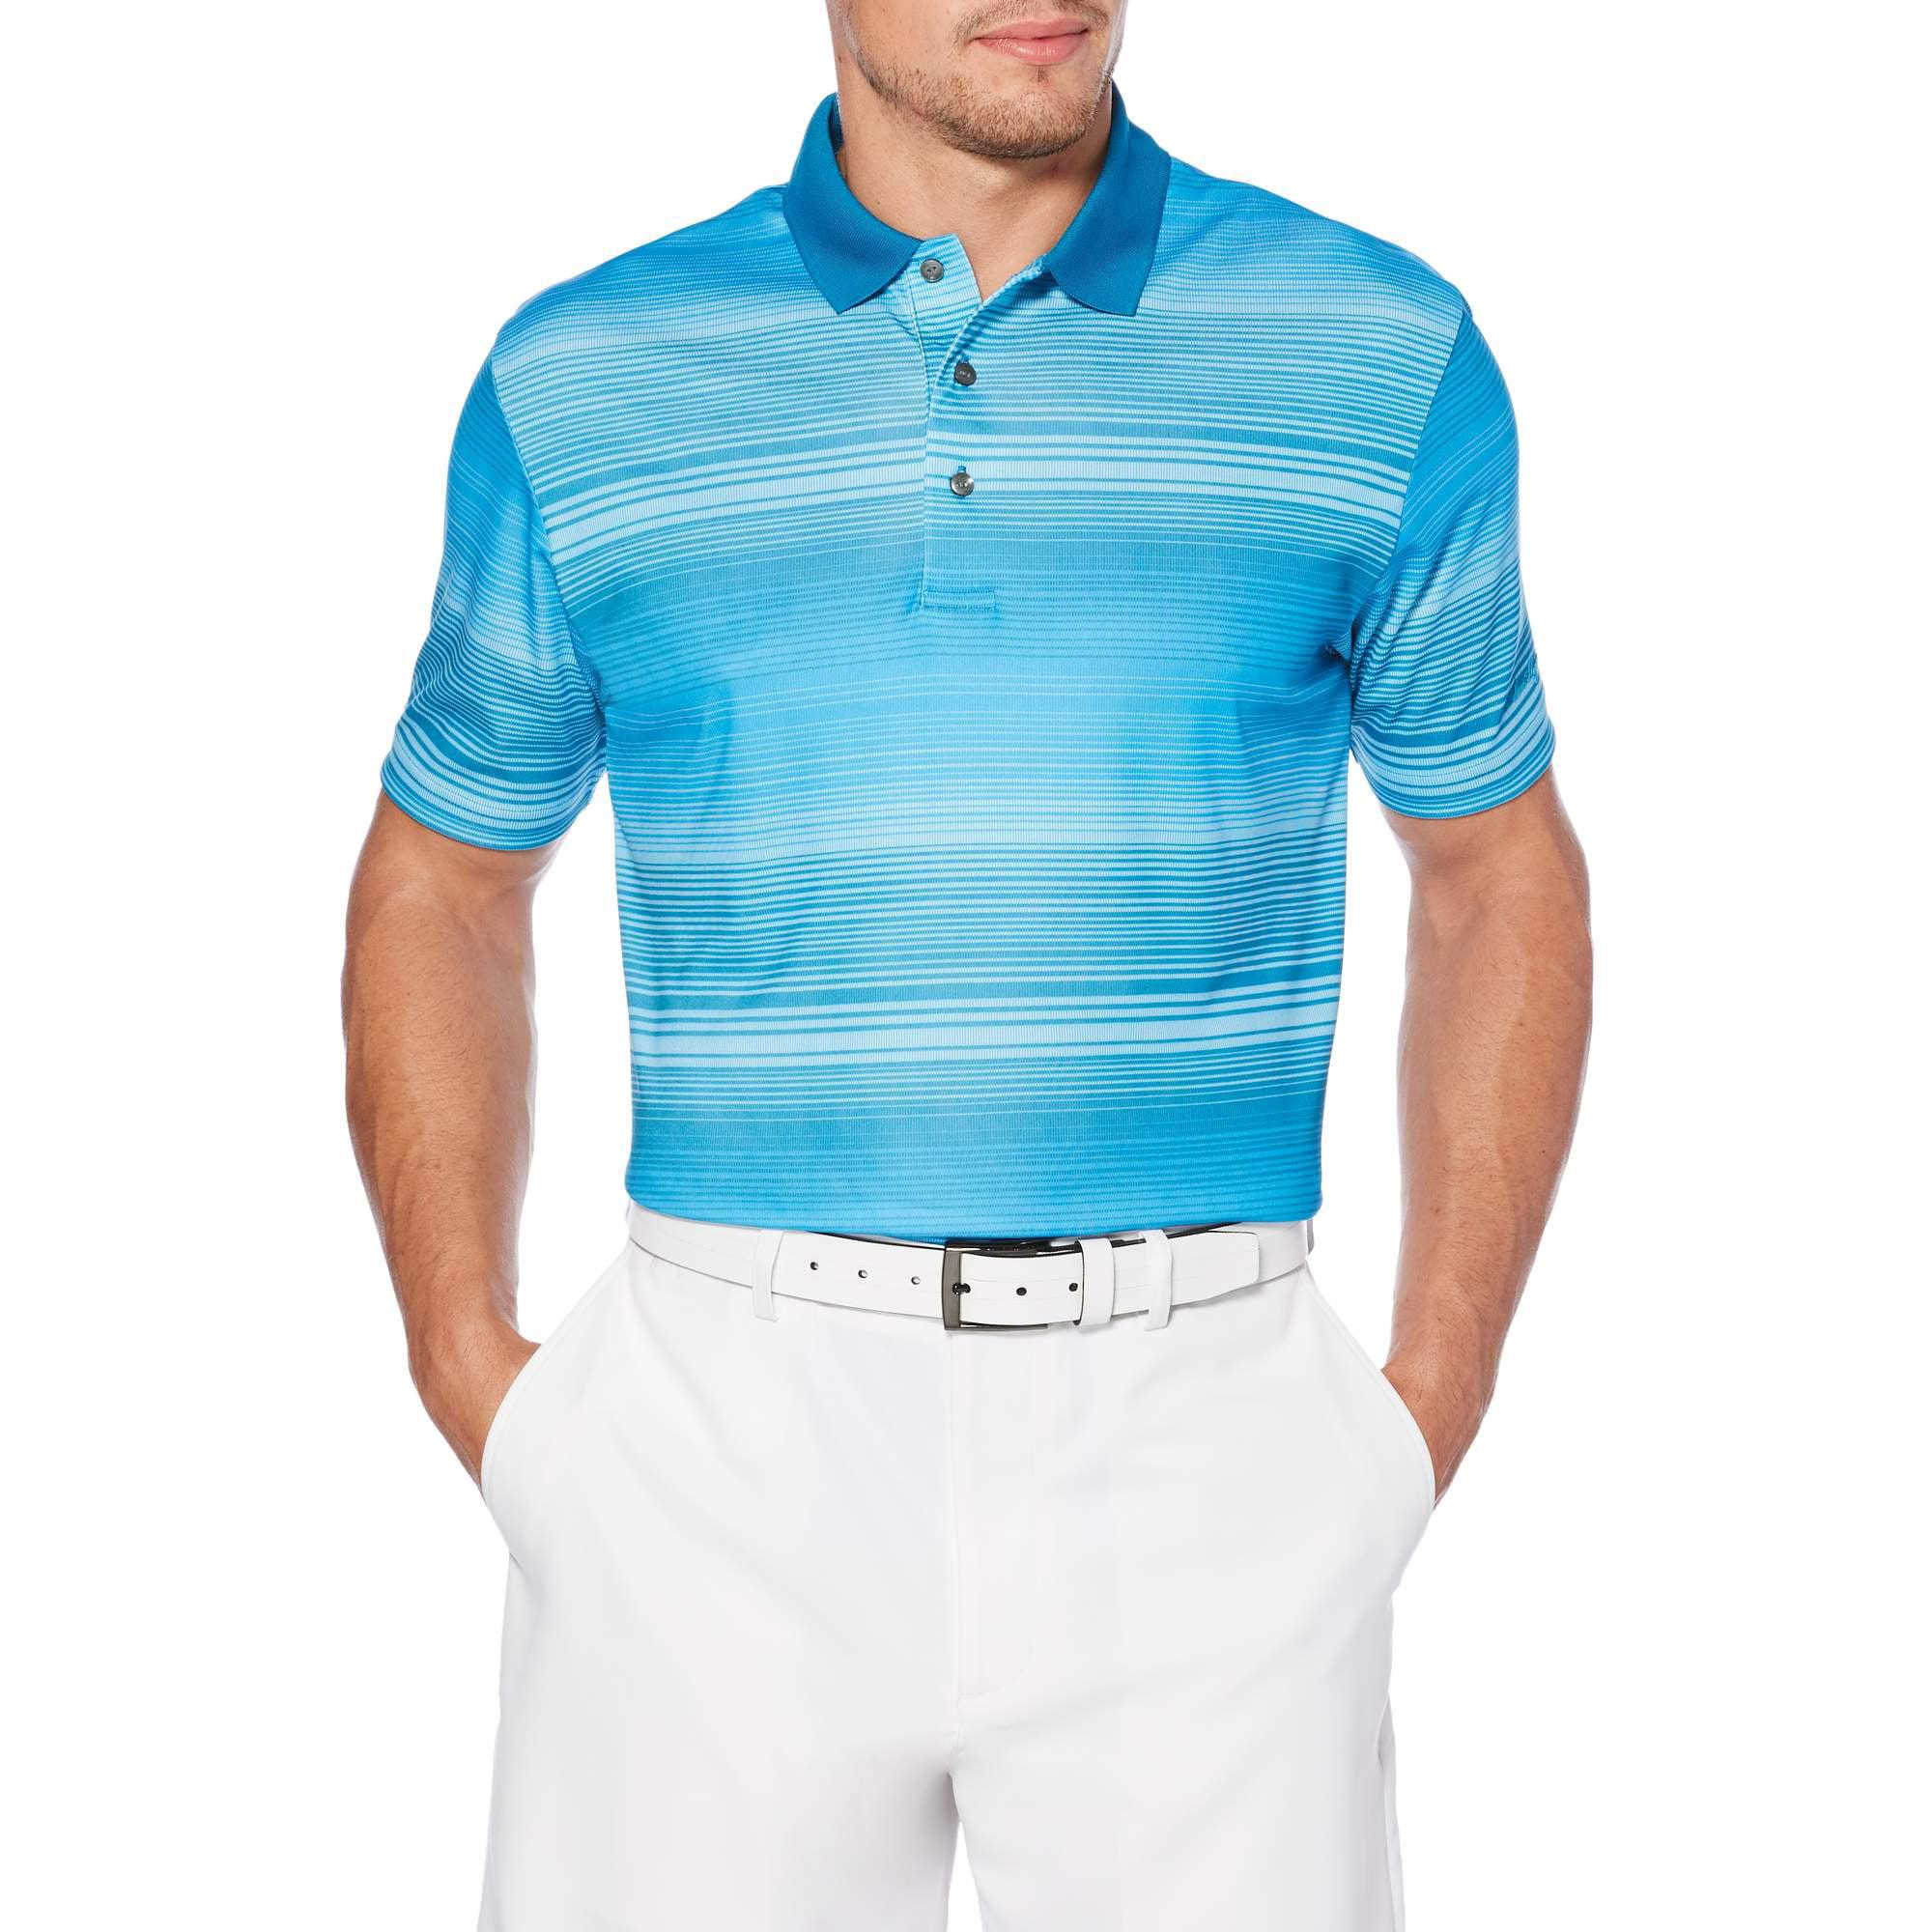 Big Men's Performance Short Sleeve Stripe Golf Polo Shirt by Generic